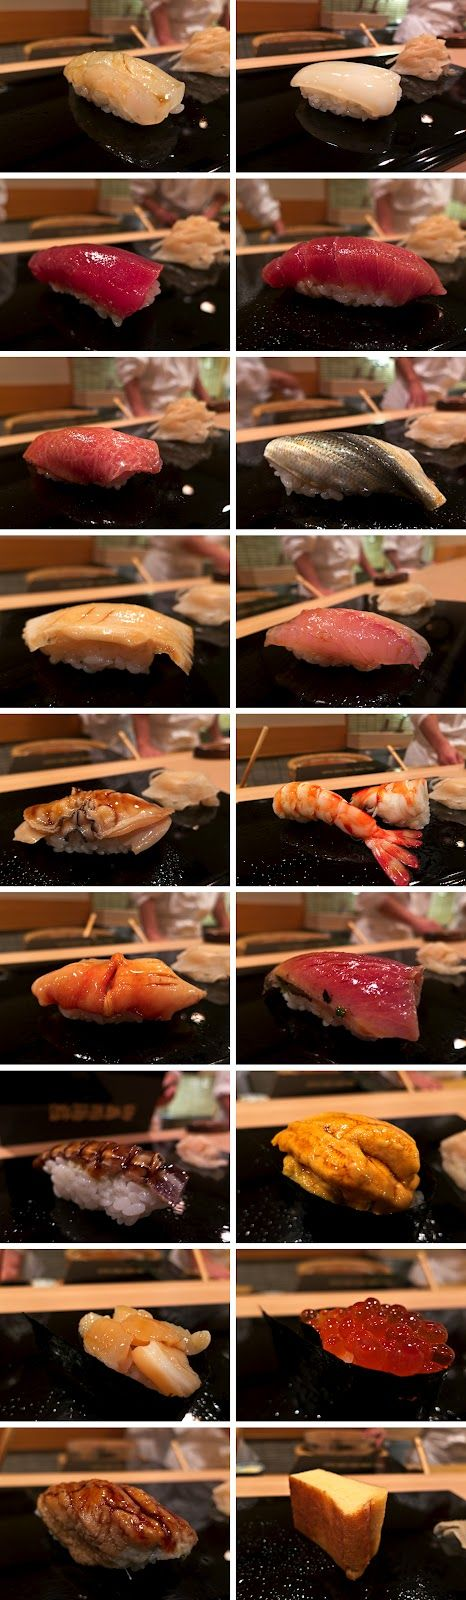 The Life of P: The Tokyo series: Sukiyabashi Jiro